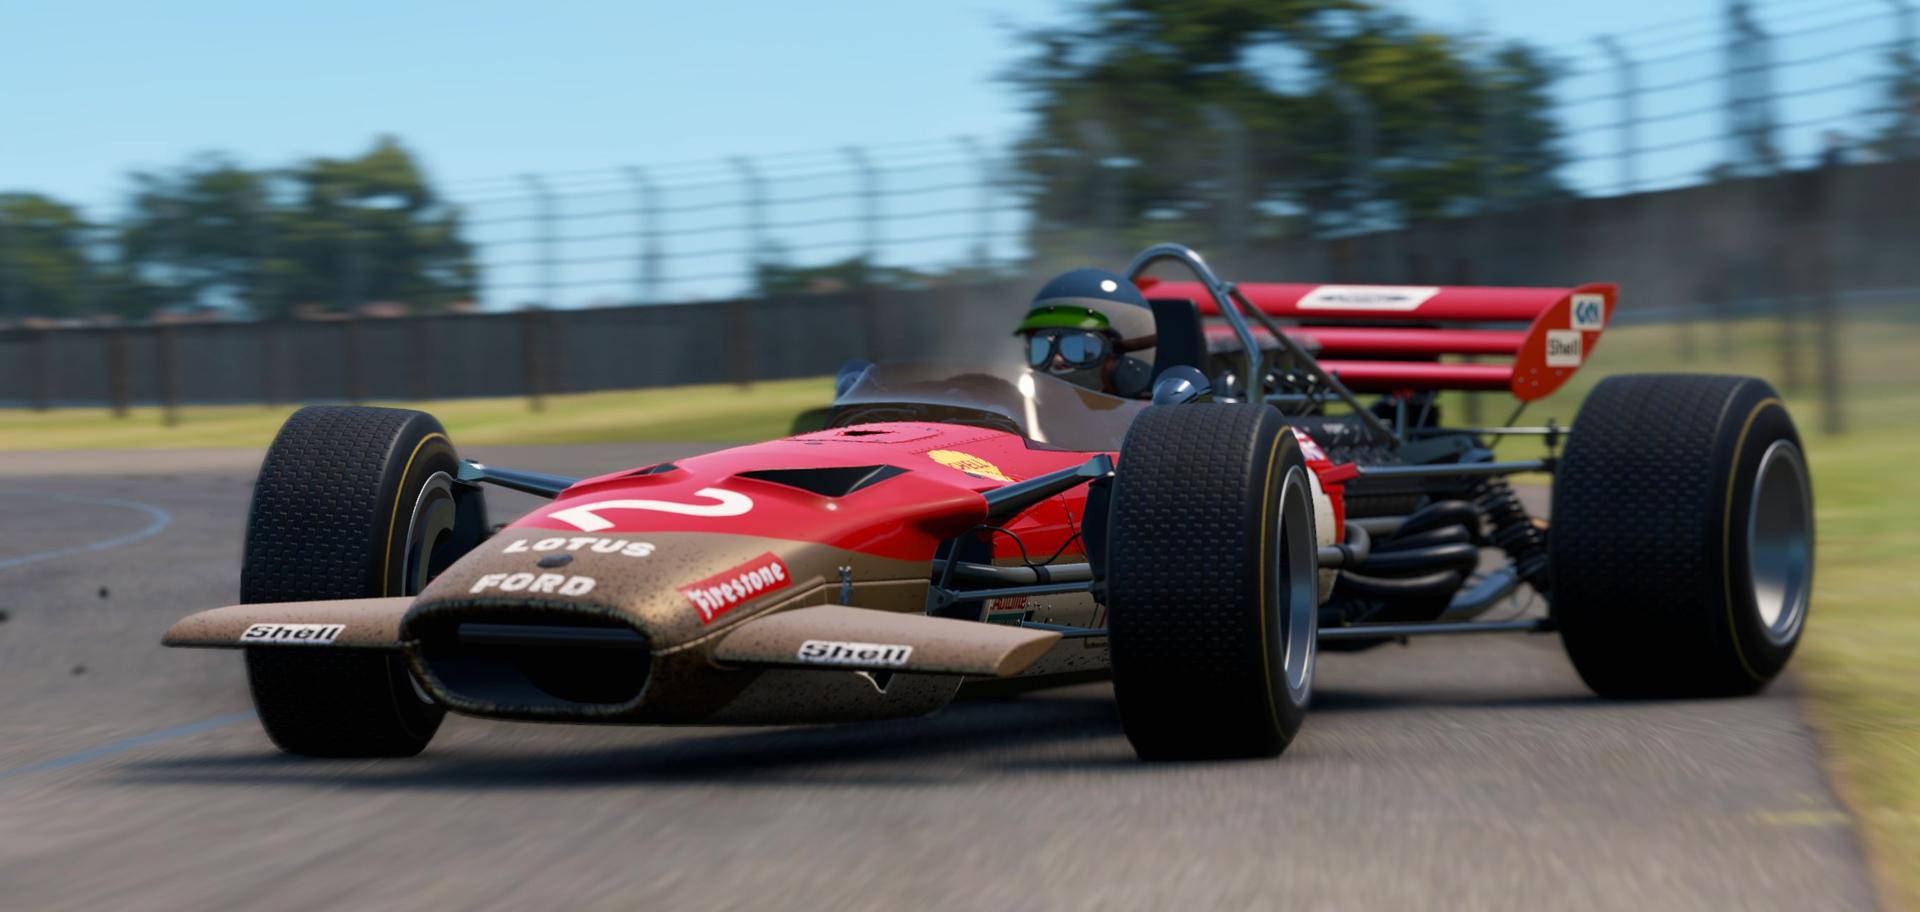 Automobilista 2 Silverstone Update v1 0 2 5-CODEX - Crack